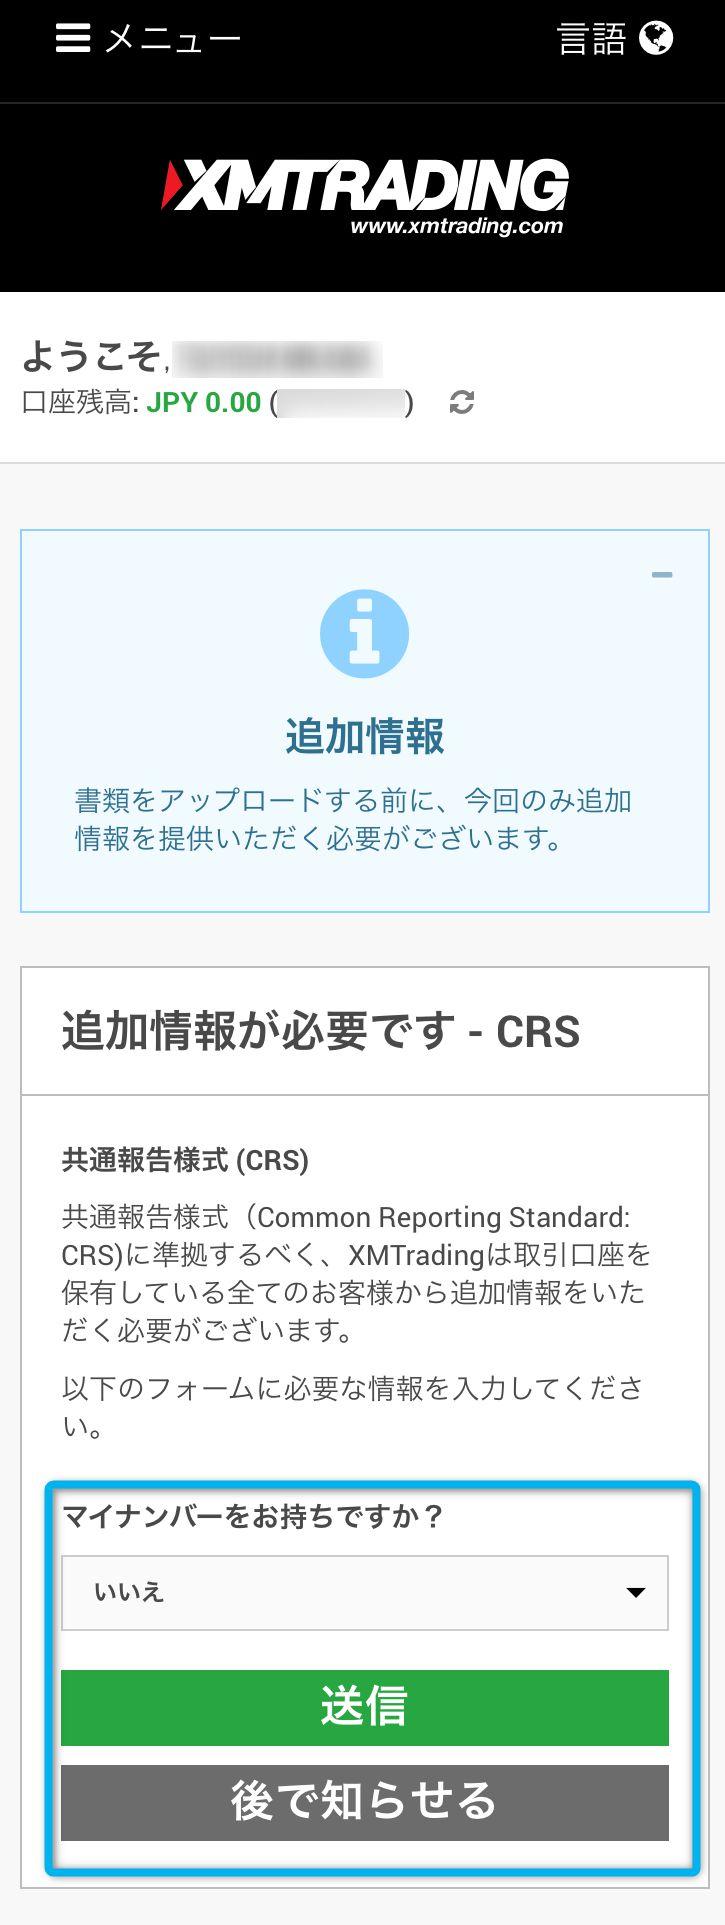 XM-CRS申告(スマホ)